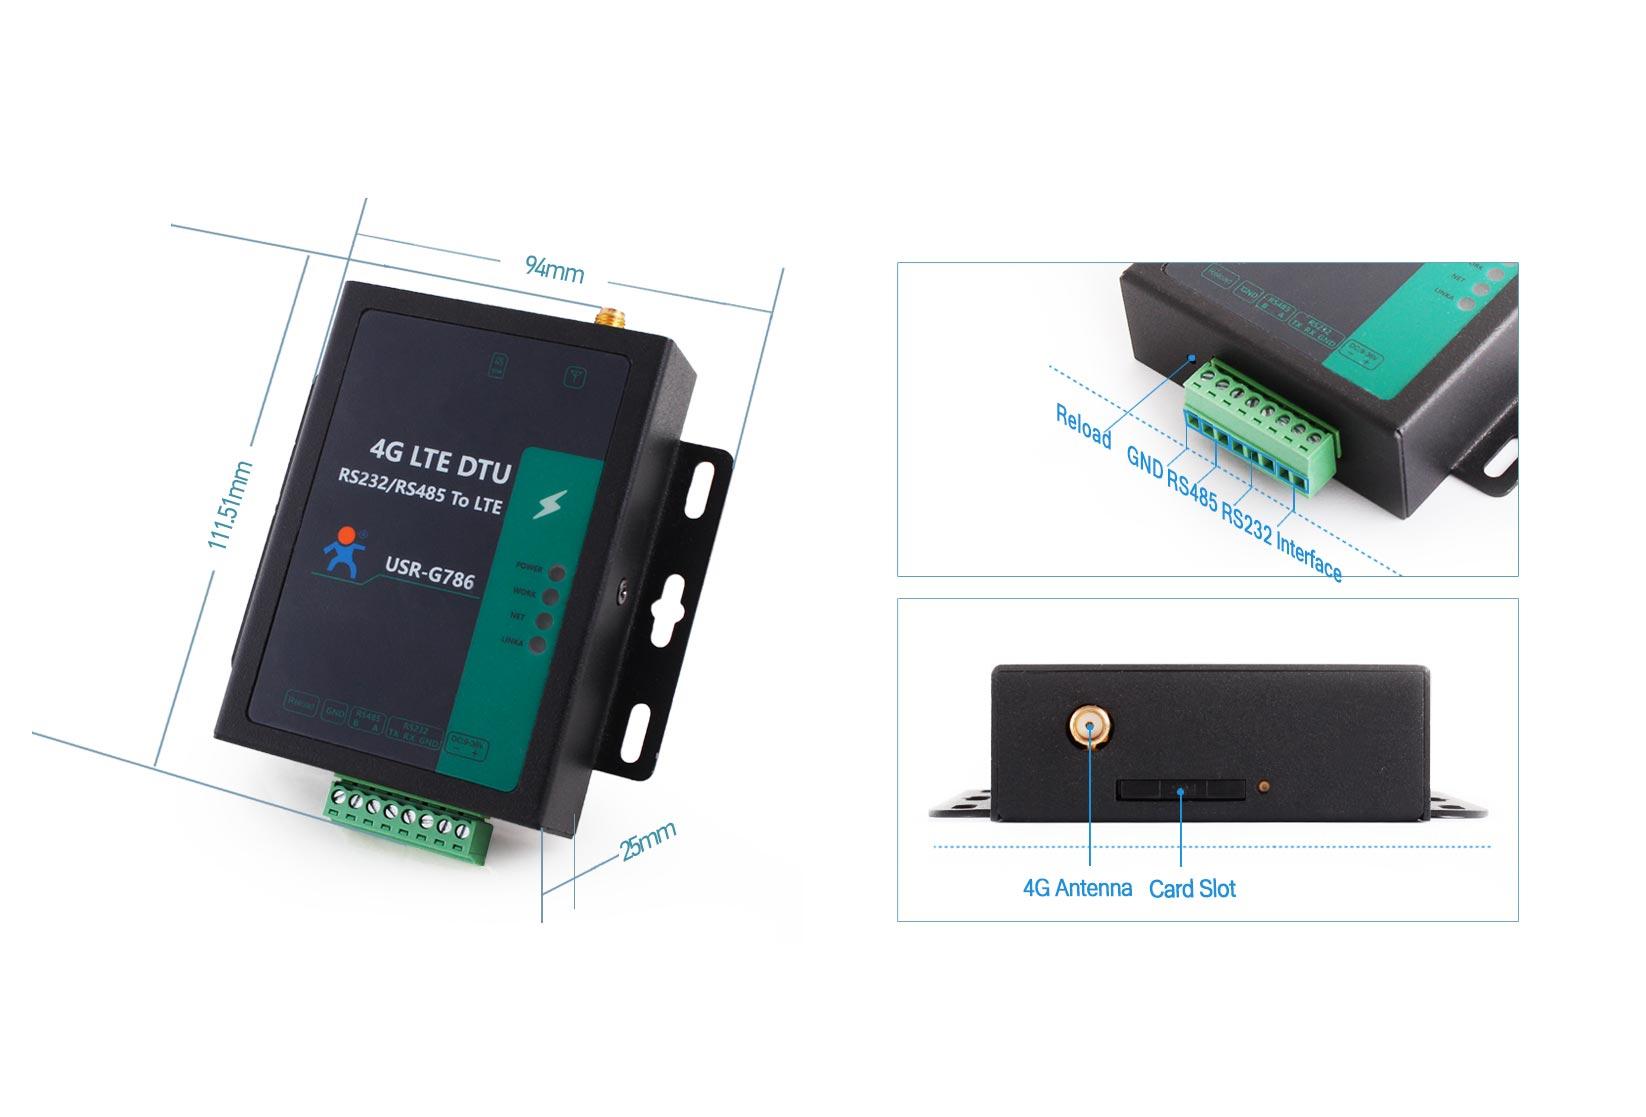 Cellular 4G LTE Modem USR-G786-E